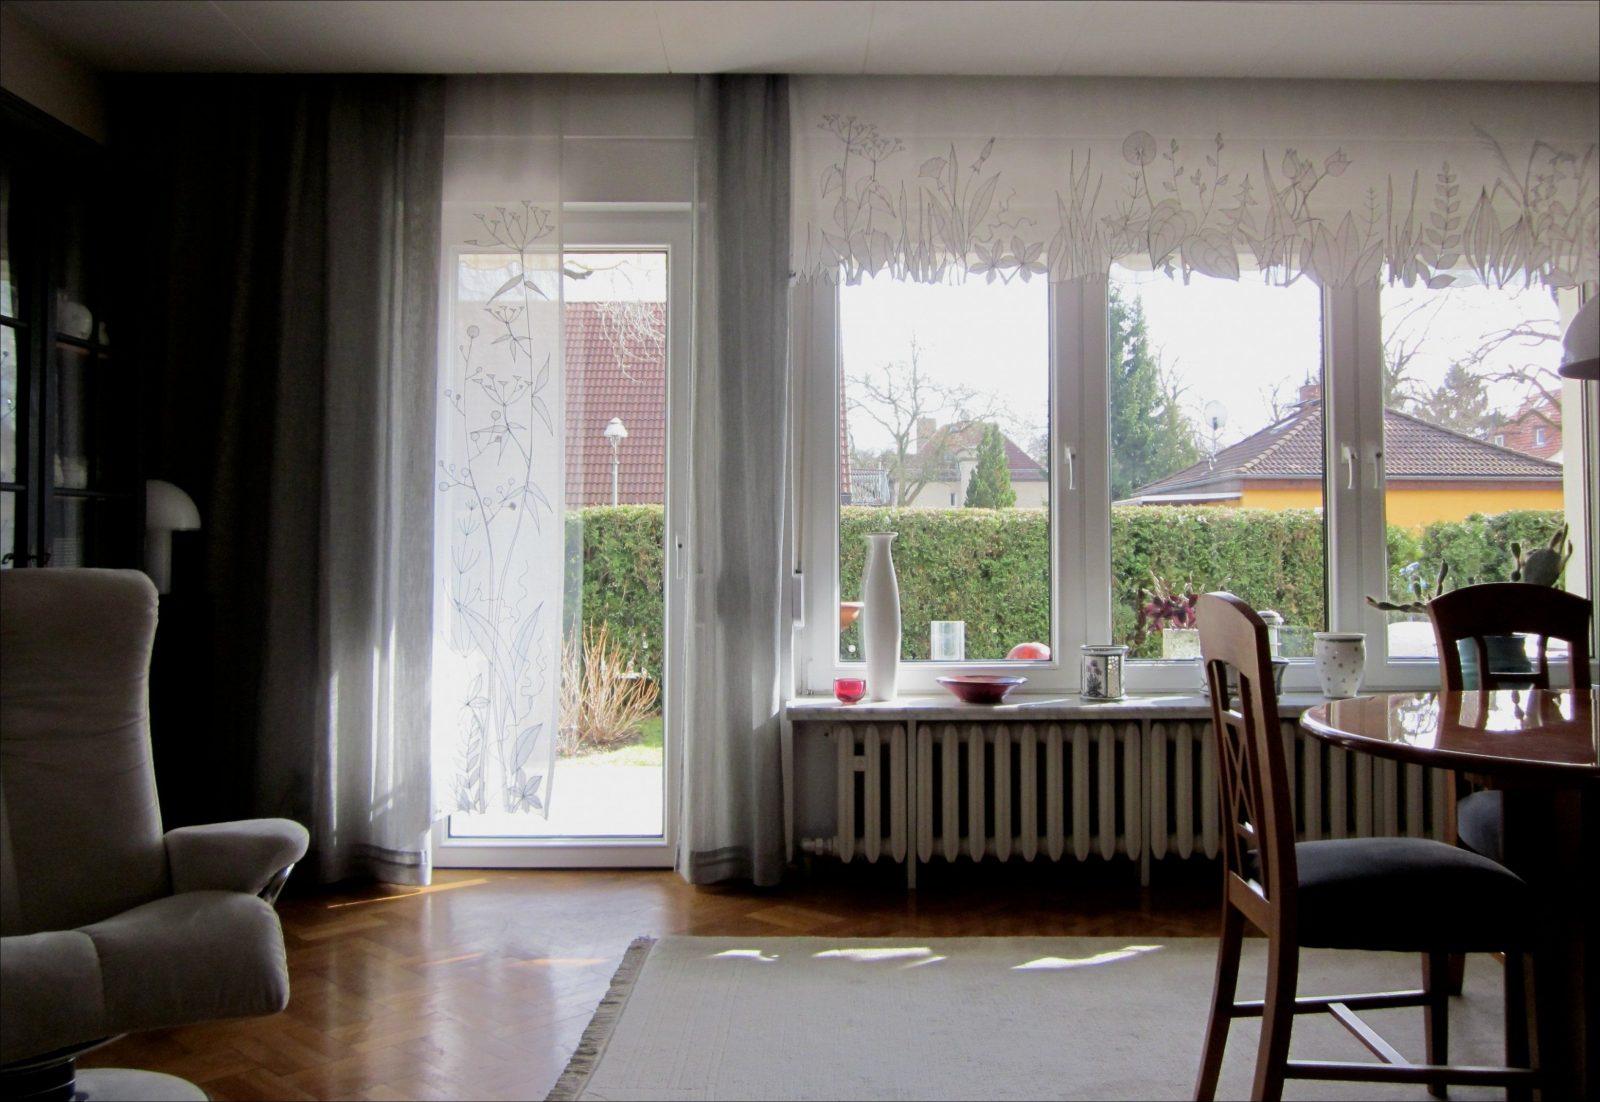 gardinen ideen f r balkont ren pauwnieuws von gardinen f r. Black Bedroom Furniture Sets. Home Design Ideas